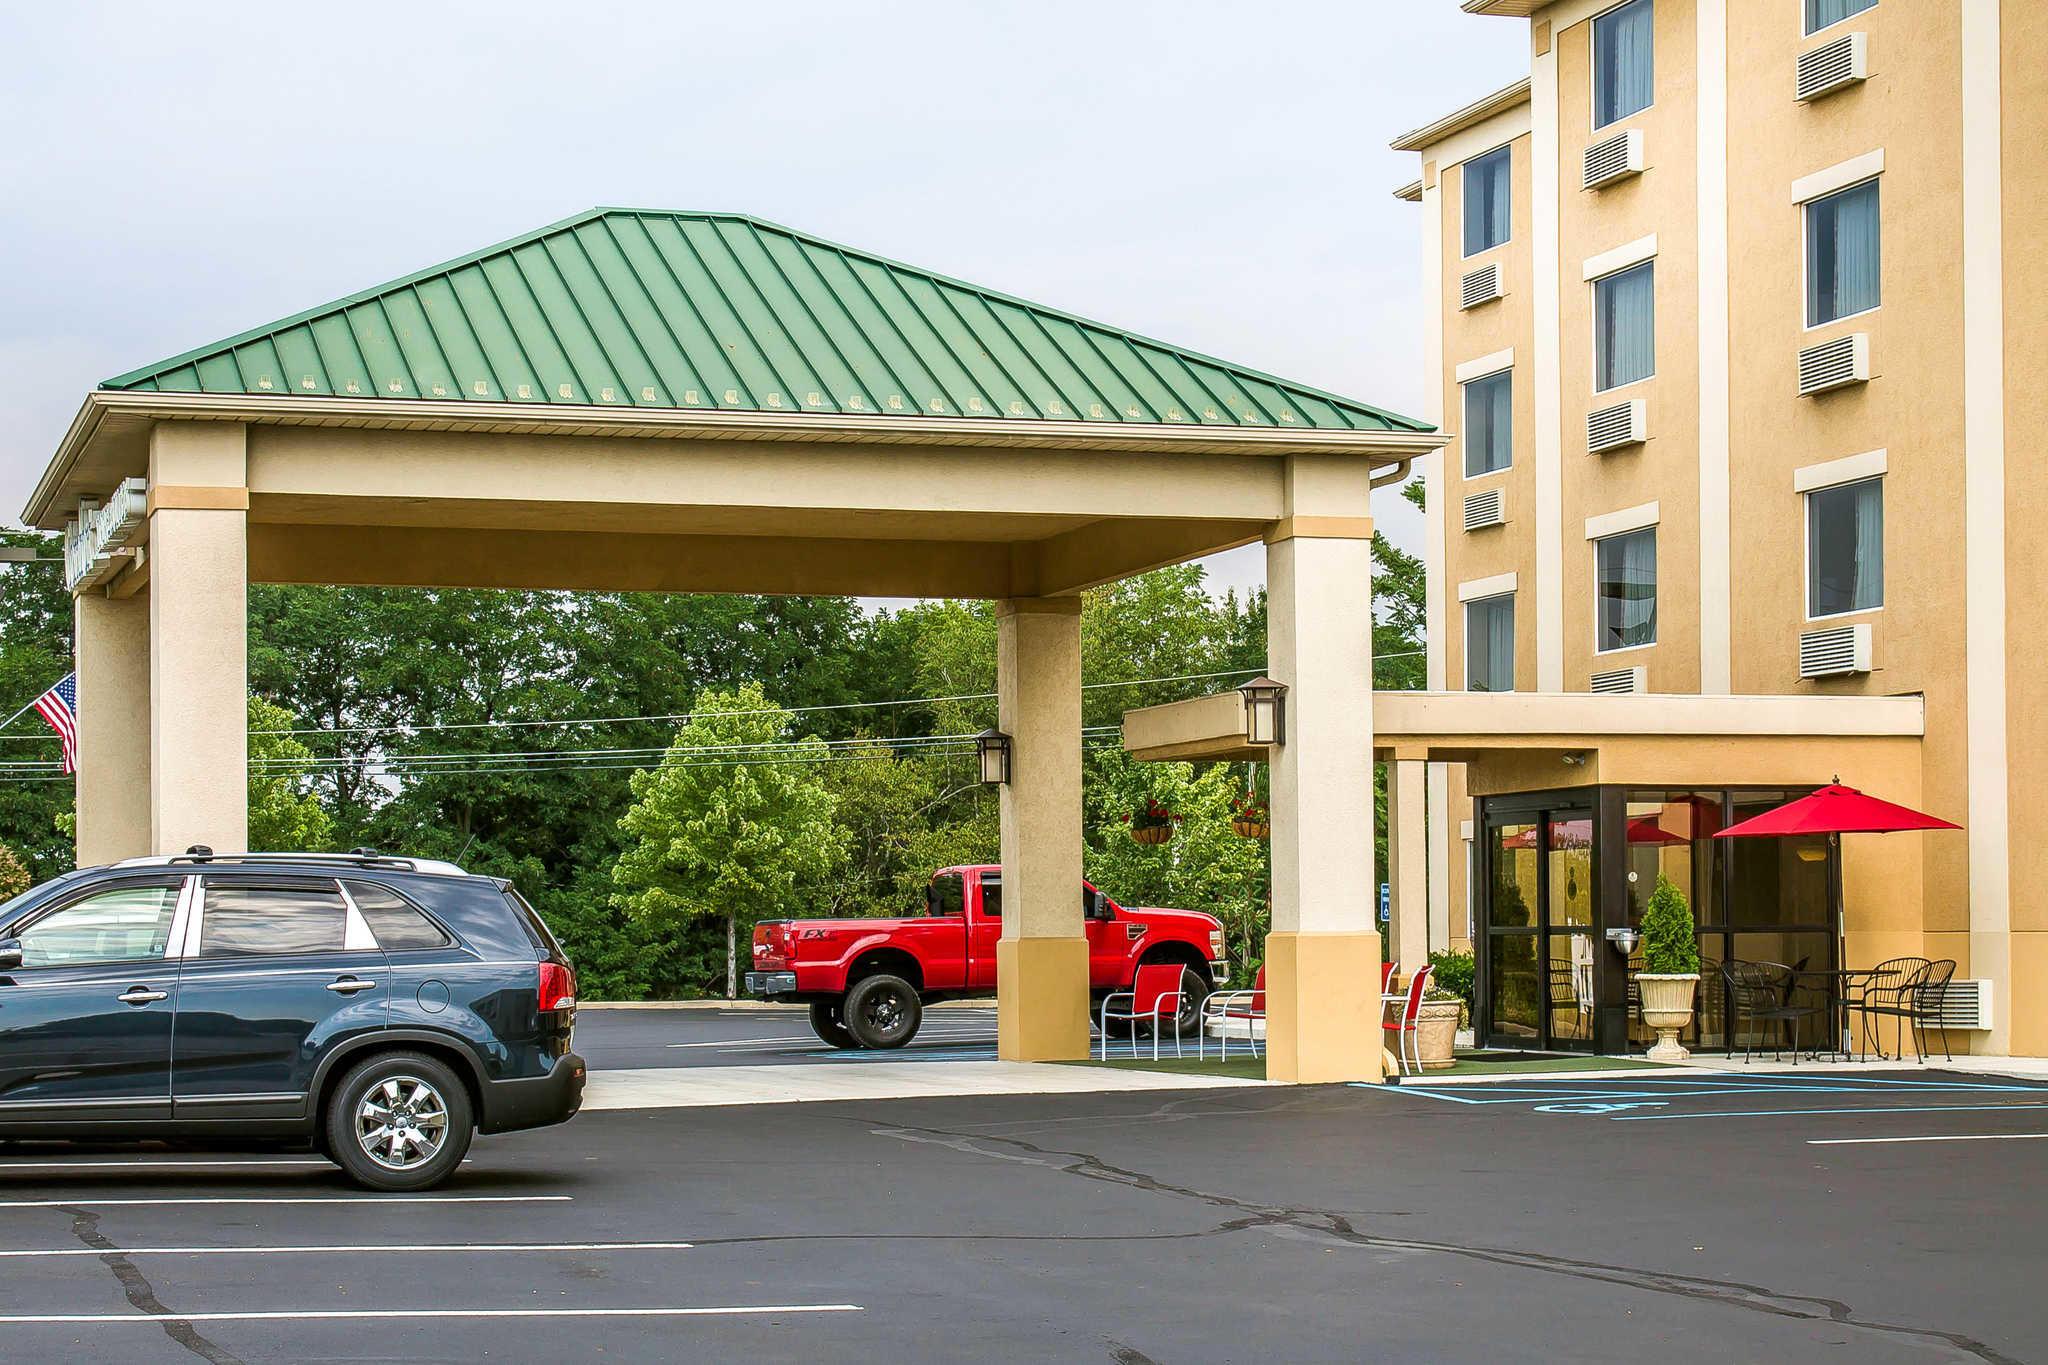 Comfort Inn & Suites image 1